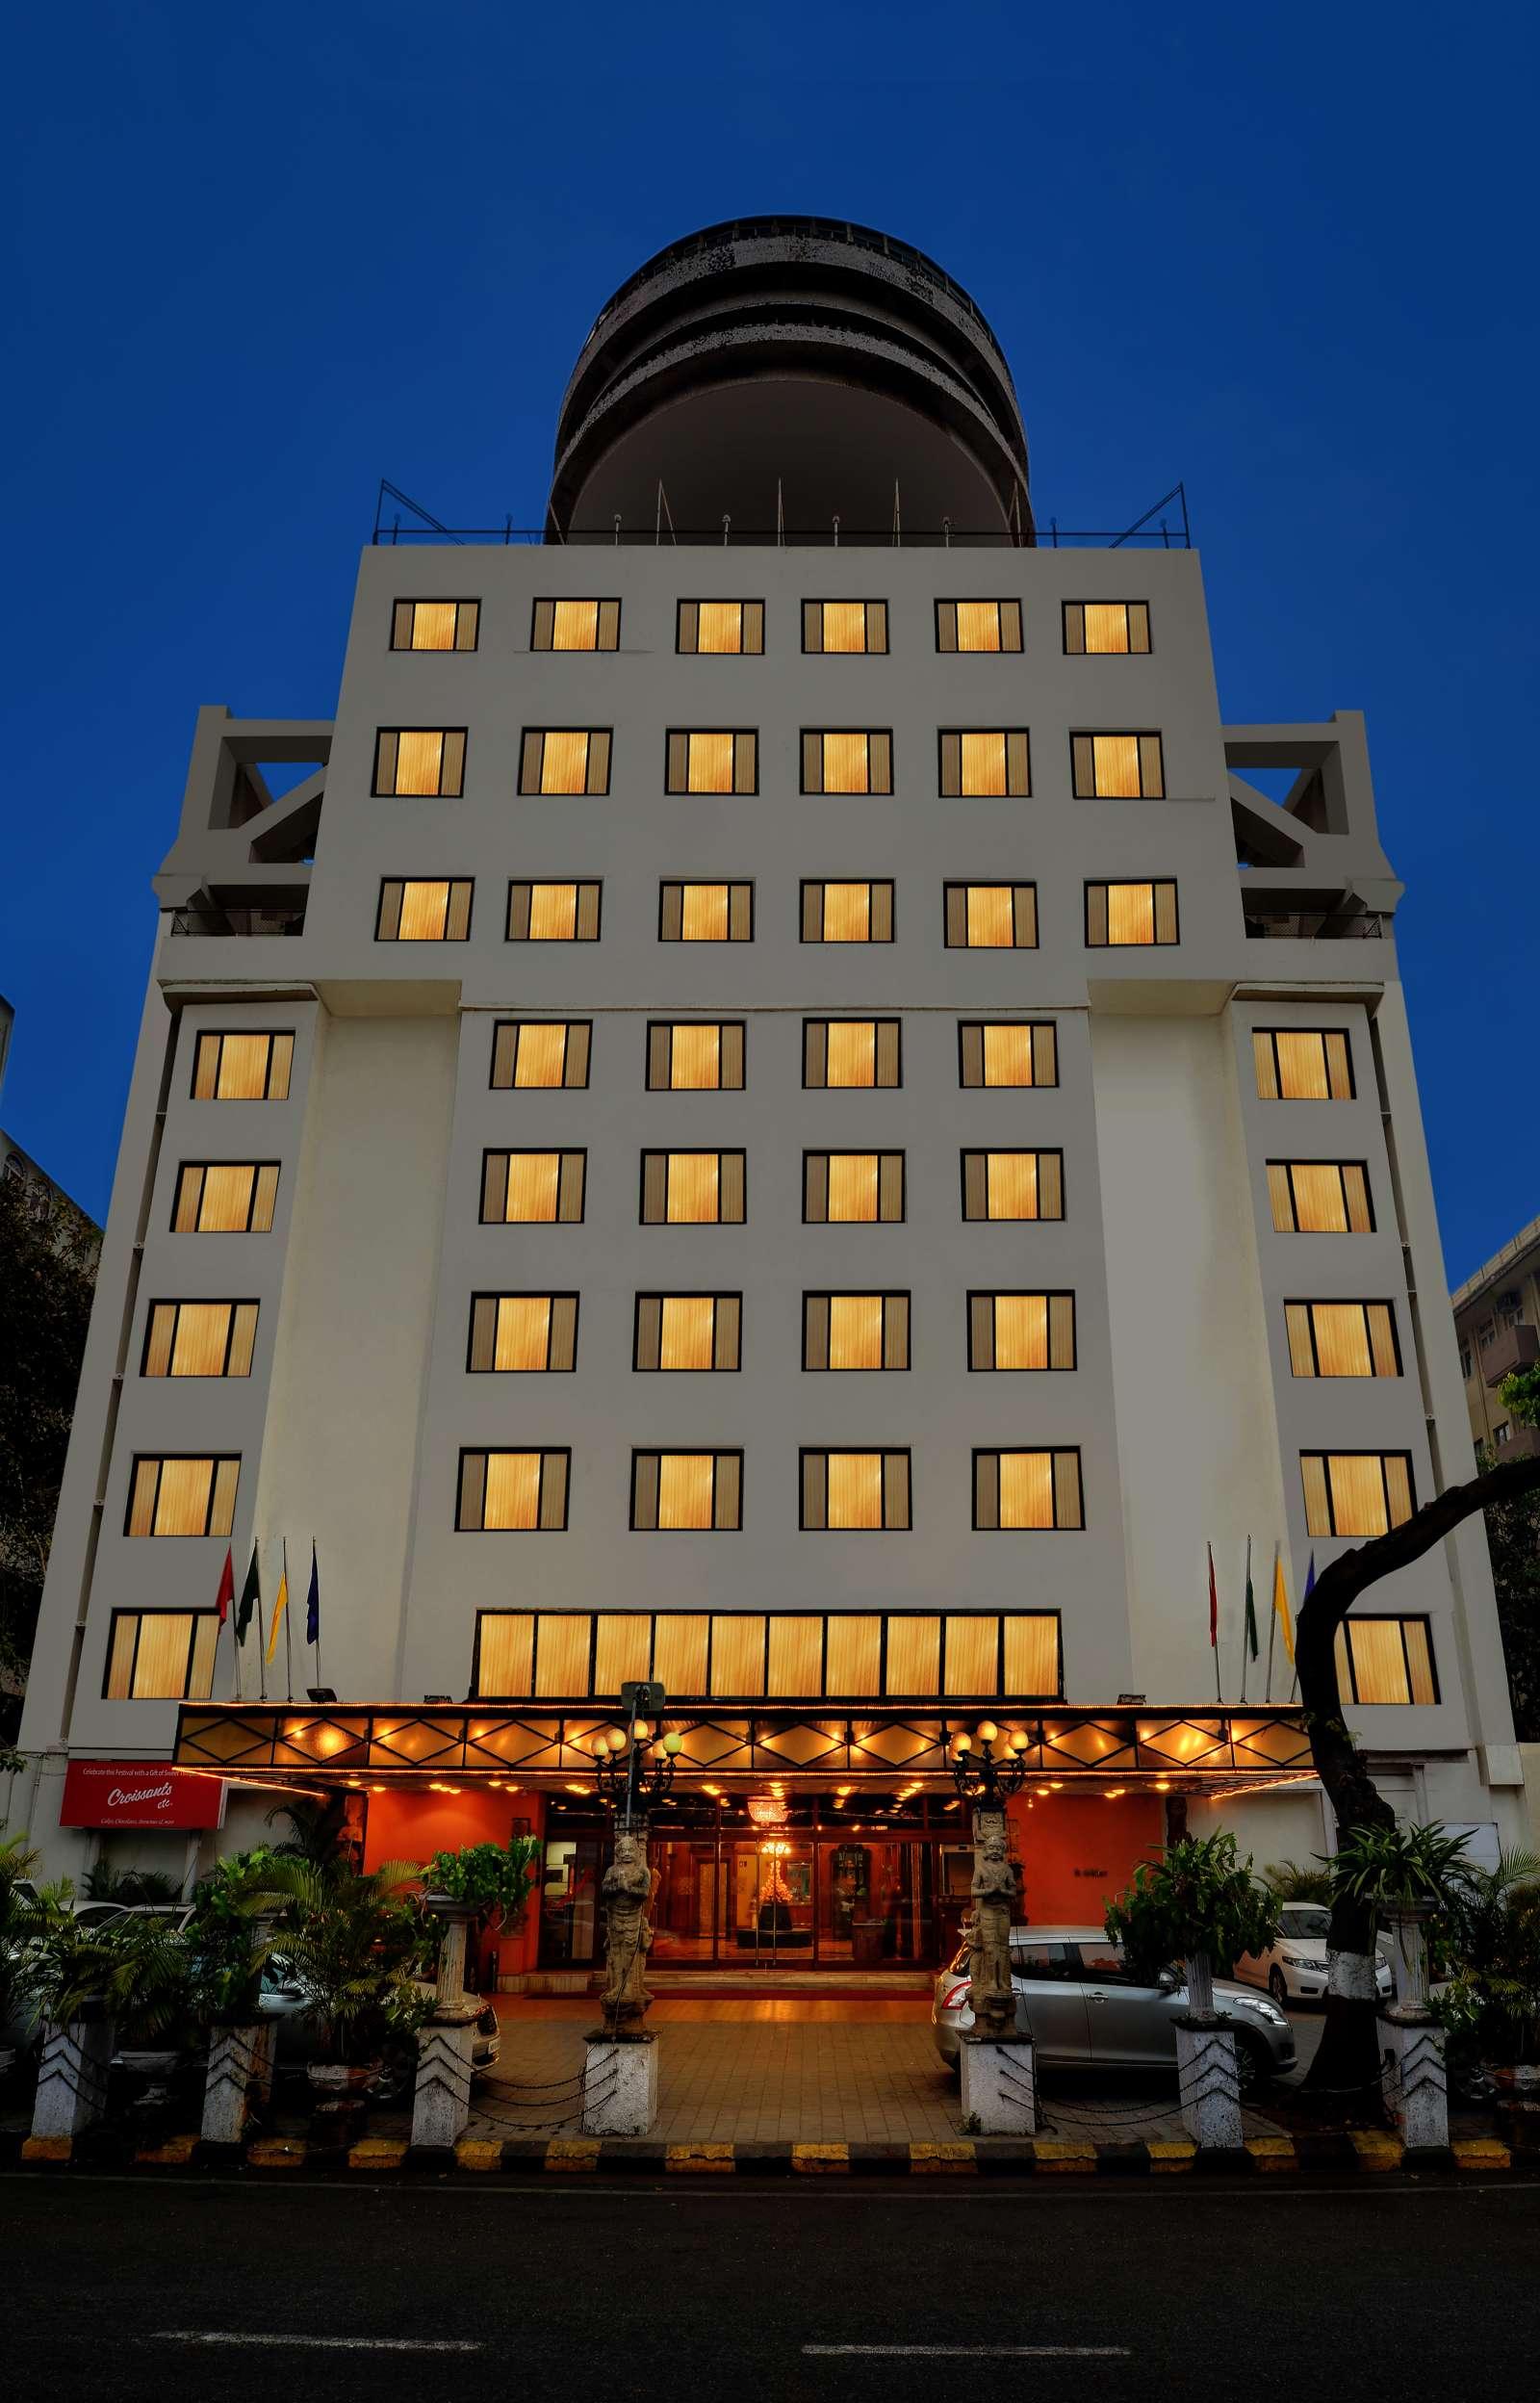 Travel Trade Journal 2020 - The Ambassador | Heritage Hotels in Mumbai, Aurangabad, Chennai - Luxury Hotels Group welcomes The Ambassador Group of Hotels to its growing Portfolio – Travel & Trade Journal